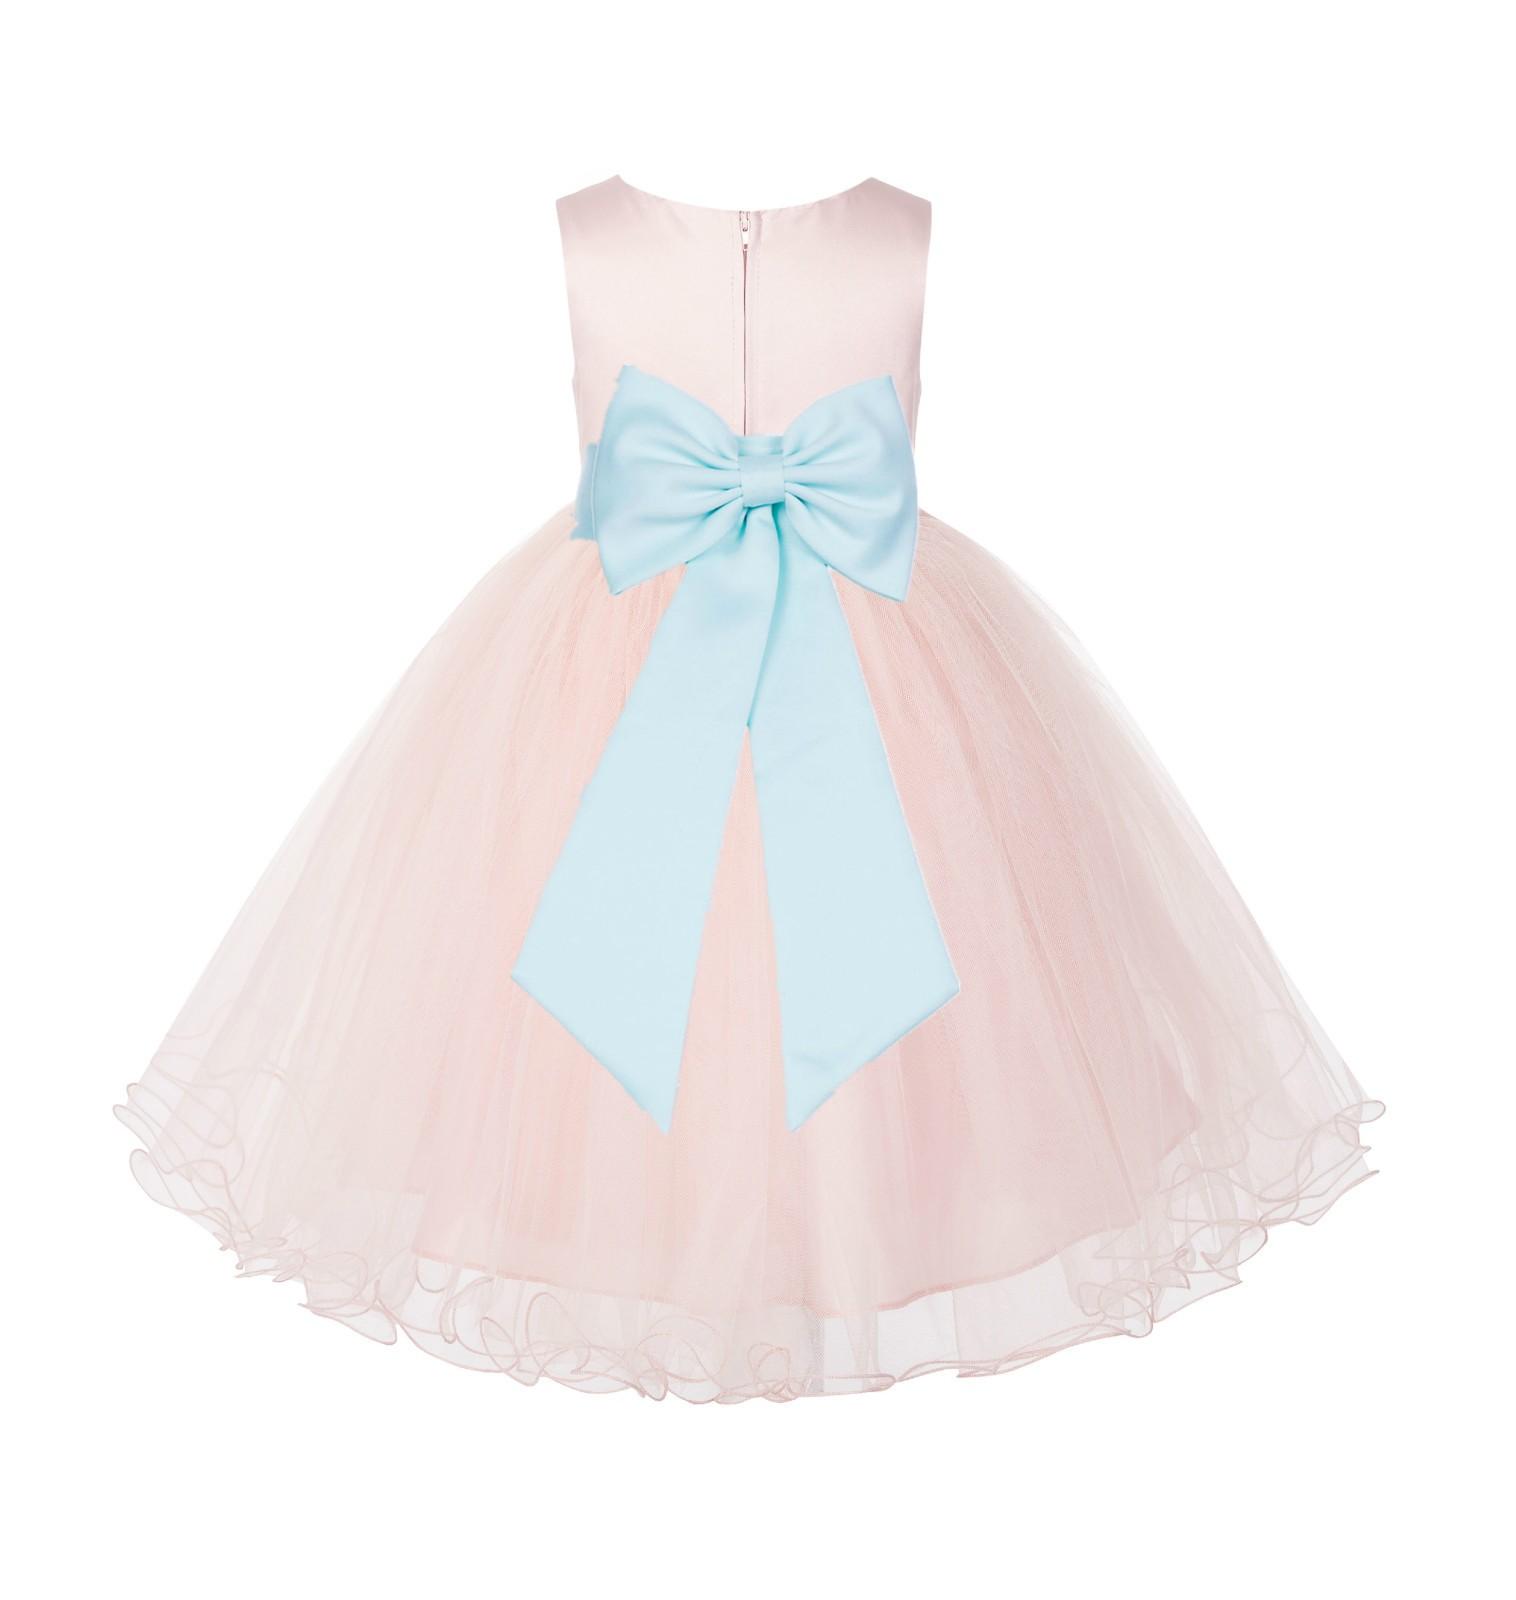 Blush PInk / Mint Tulle Rattail Edge Flower Girl Dress Wedding Bridesmaid 829T